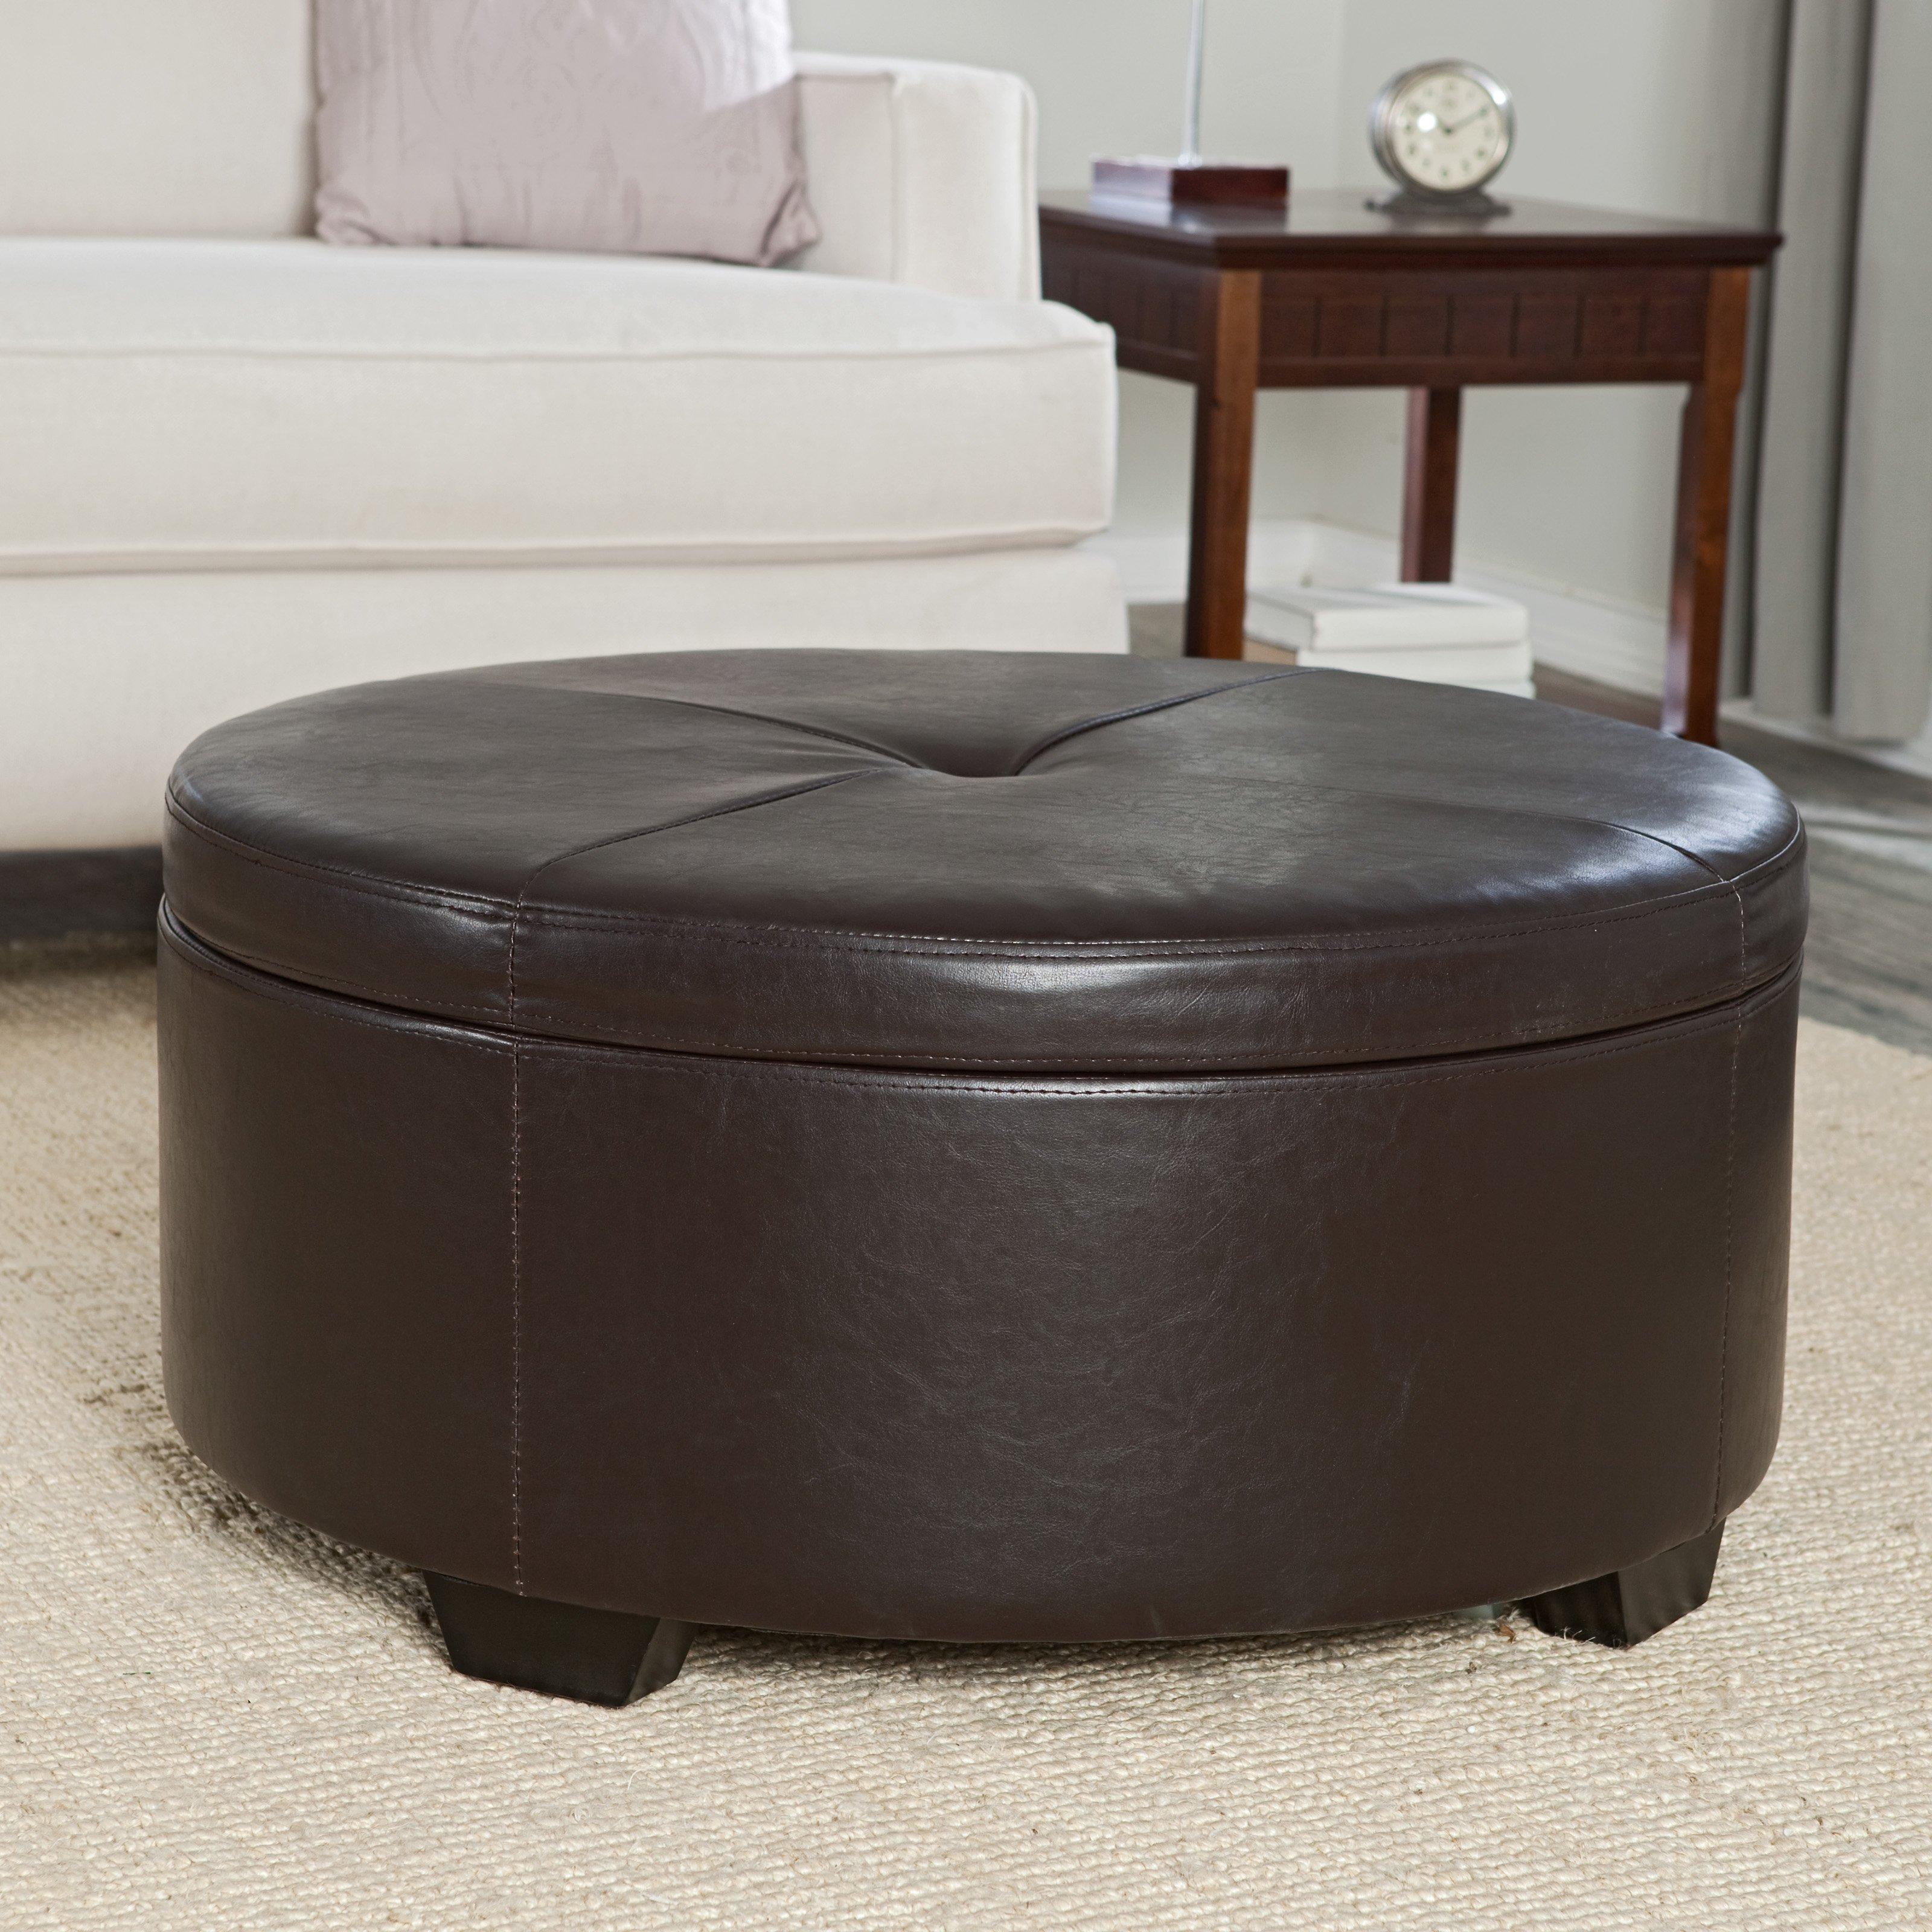 Small Round Ottoman